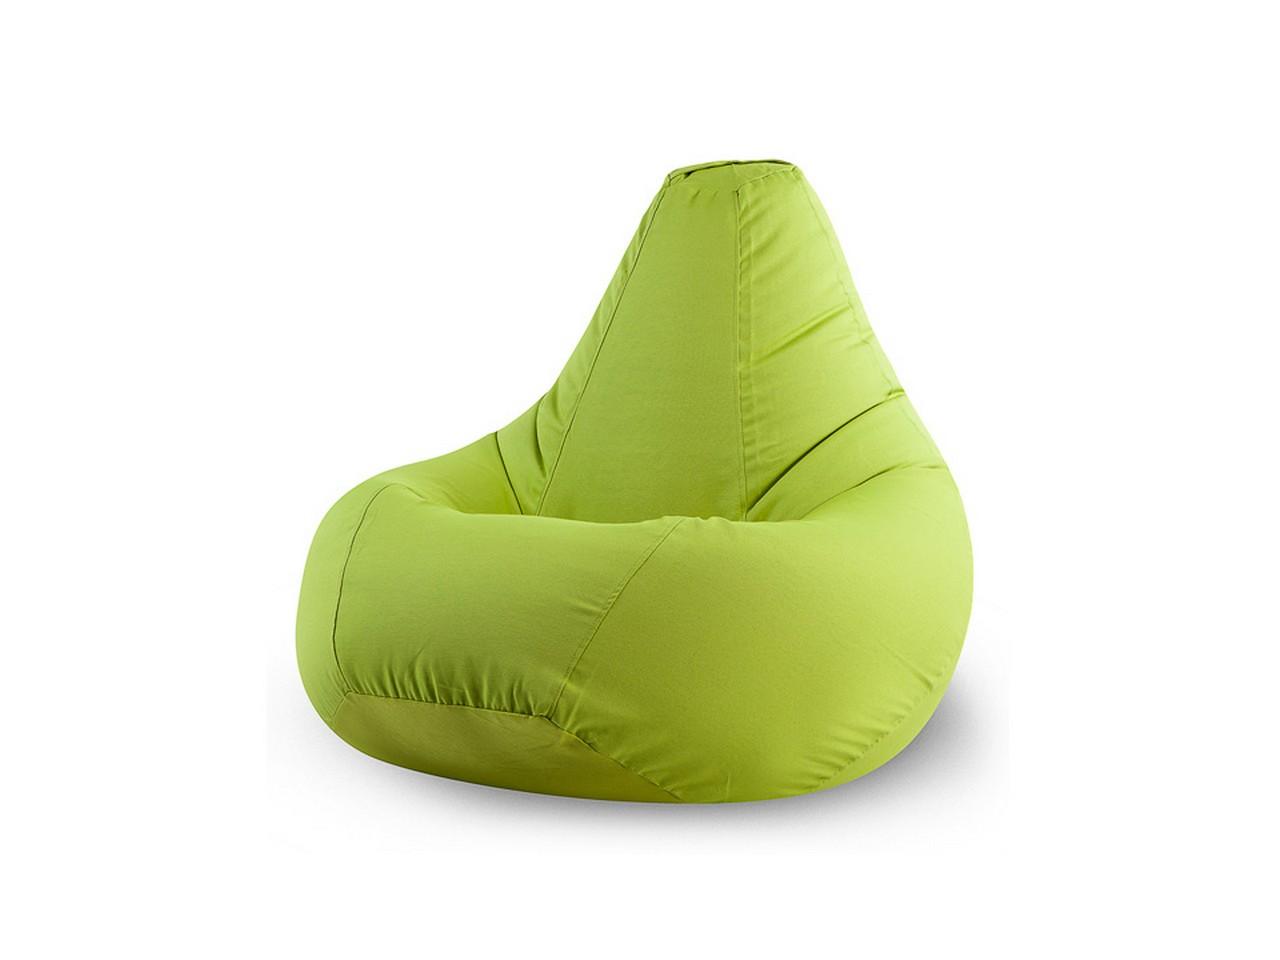 Кресло-мешок Pesko Green XLБесформенные пуфы<br>&amp;lt;div&amp;gt;Съемный чехол: Да (на молнии);&amp;lt;/div&amp;gt;&amp;lt;div&amp;gt;Наполнитель: пенополистирол (гранула 2 мм).&amp;lt;/div&amp;gt;<br><br>Material: Текстиль<br>Height см: 135<br>Diameter см: 90